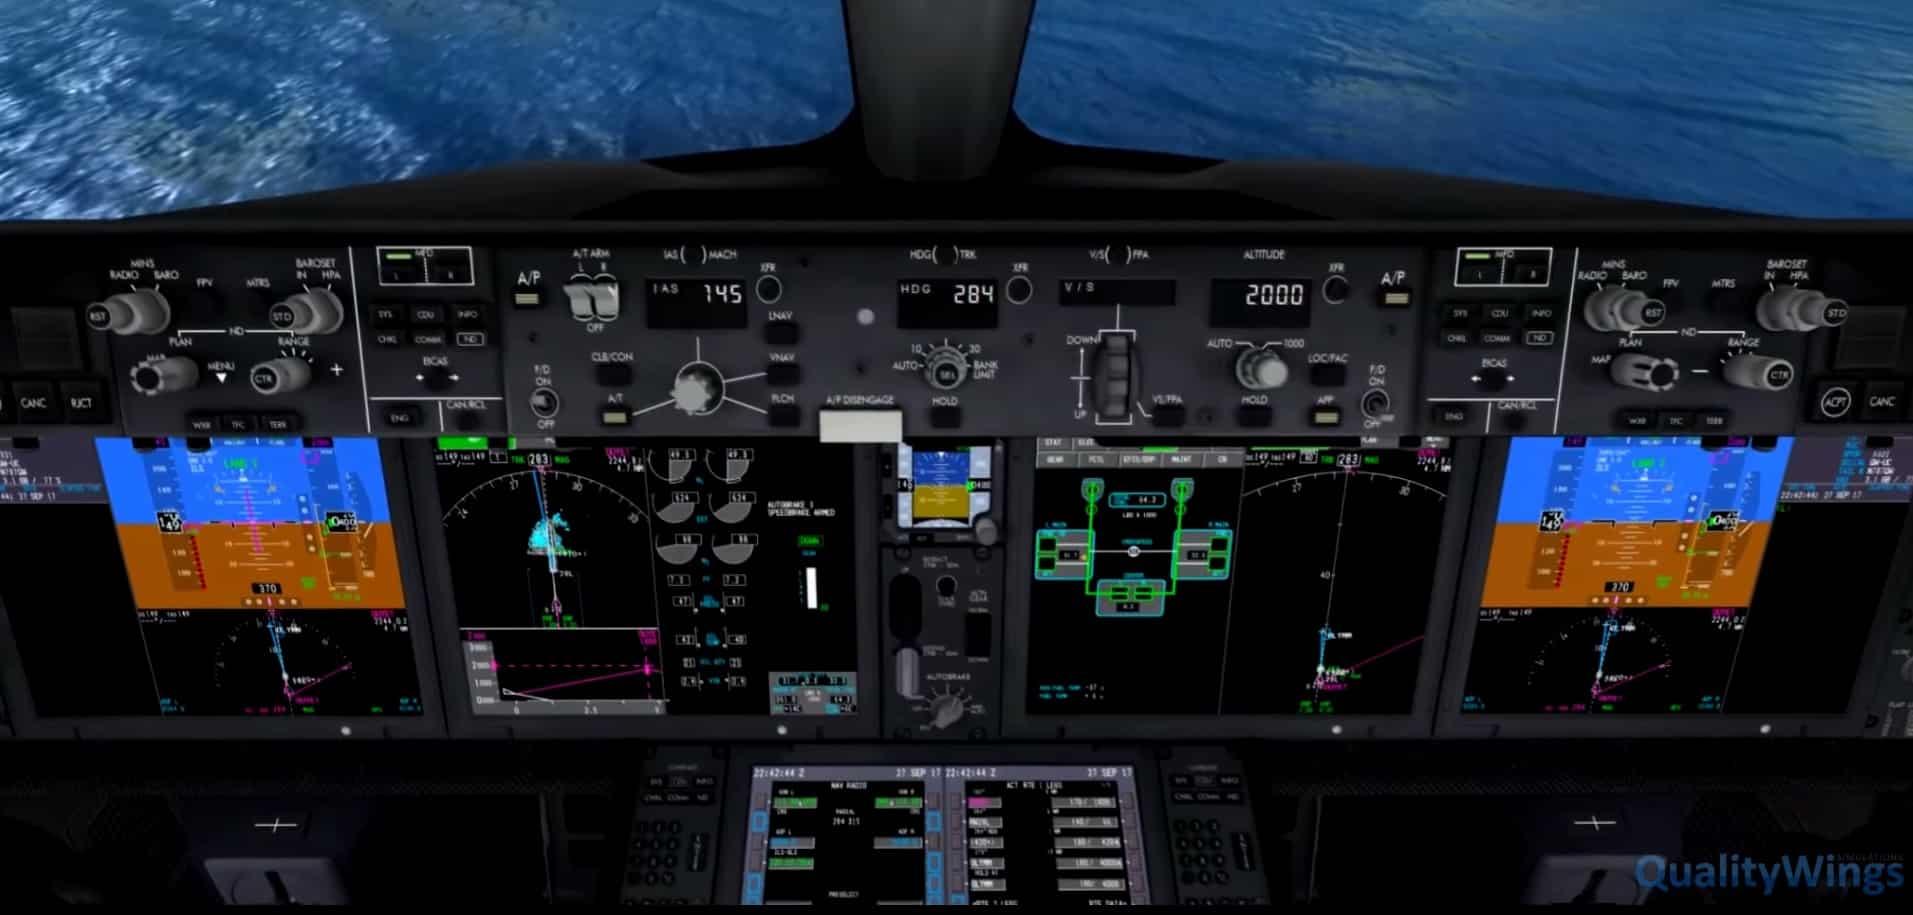 QualityWings 787 HotFix 1 0 1